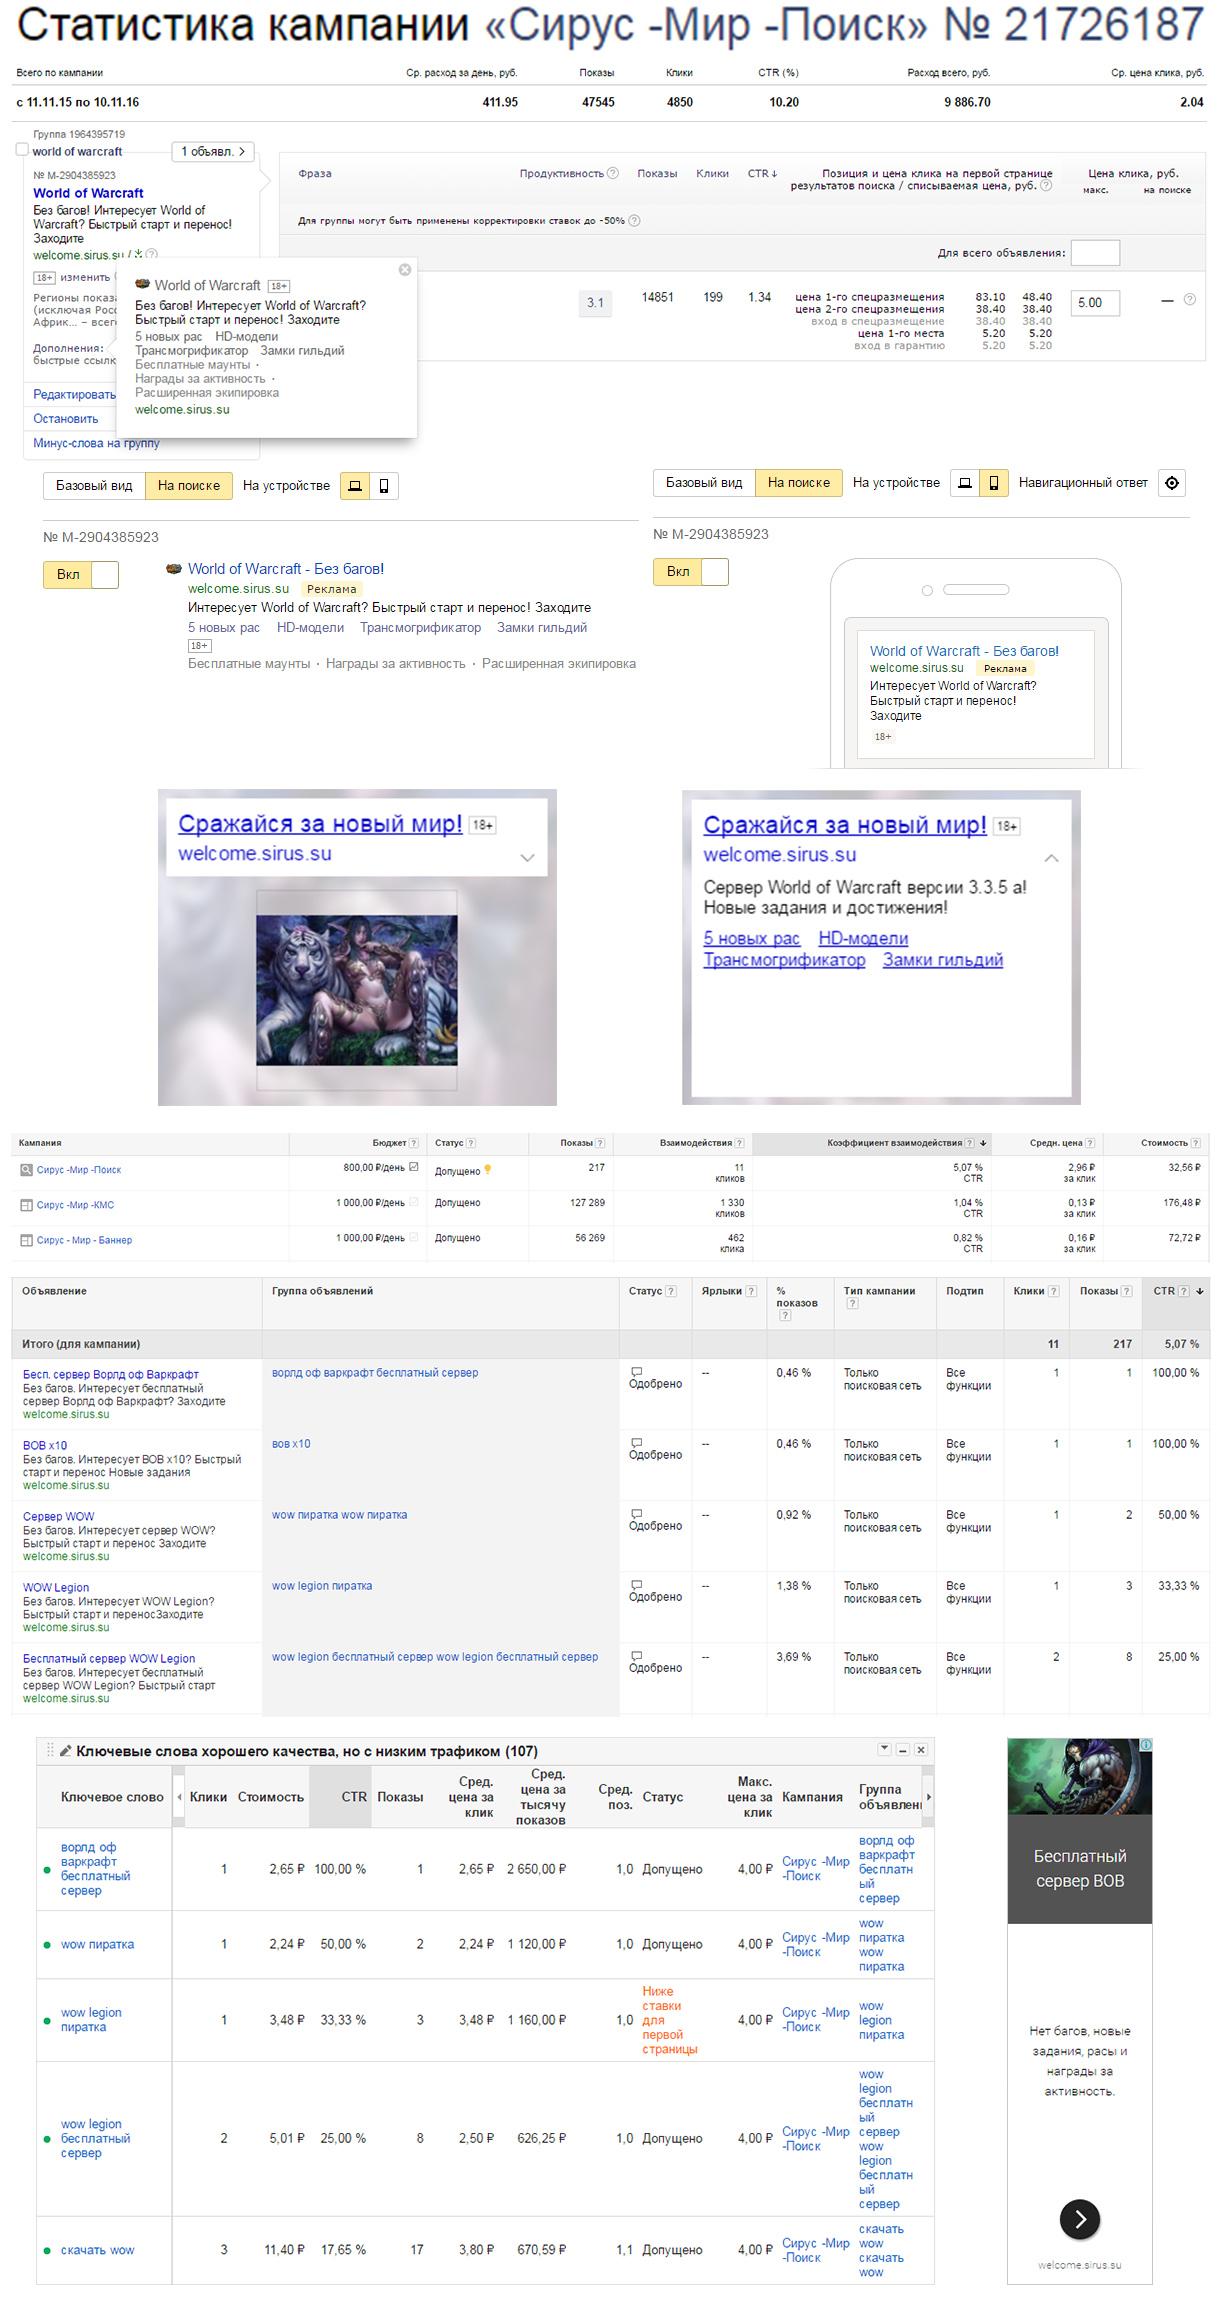 Игровой сервис WoW - Директ+Адвордс / CTR 5-10%